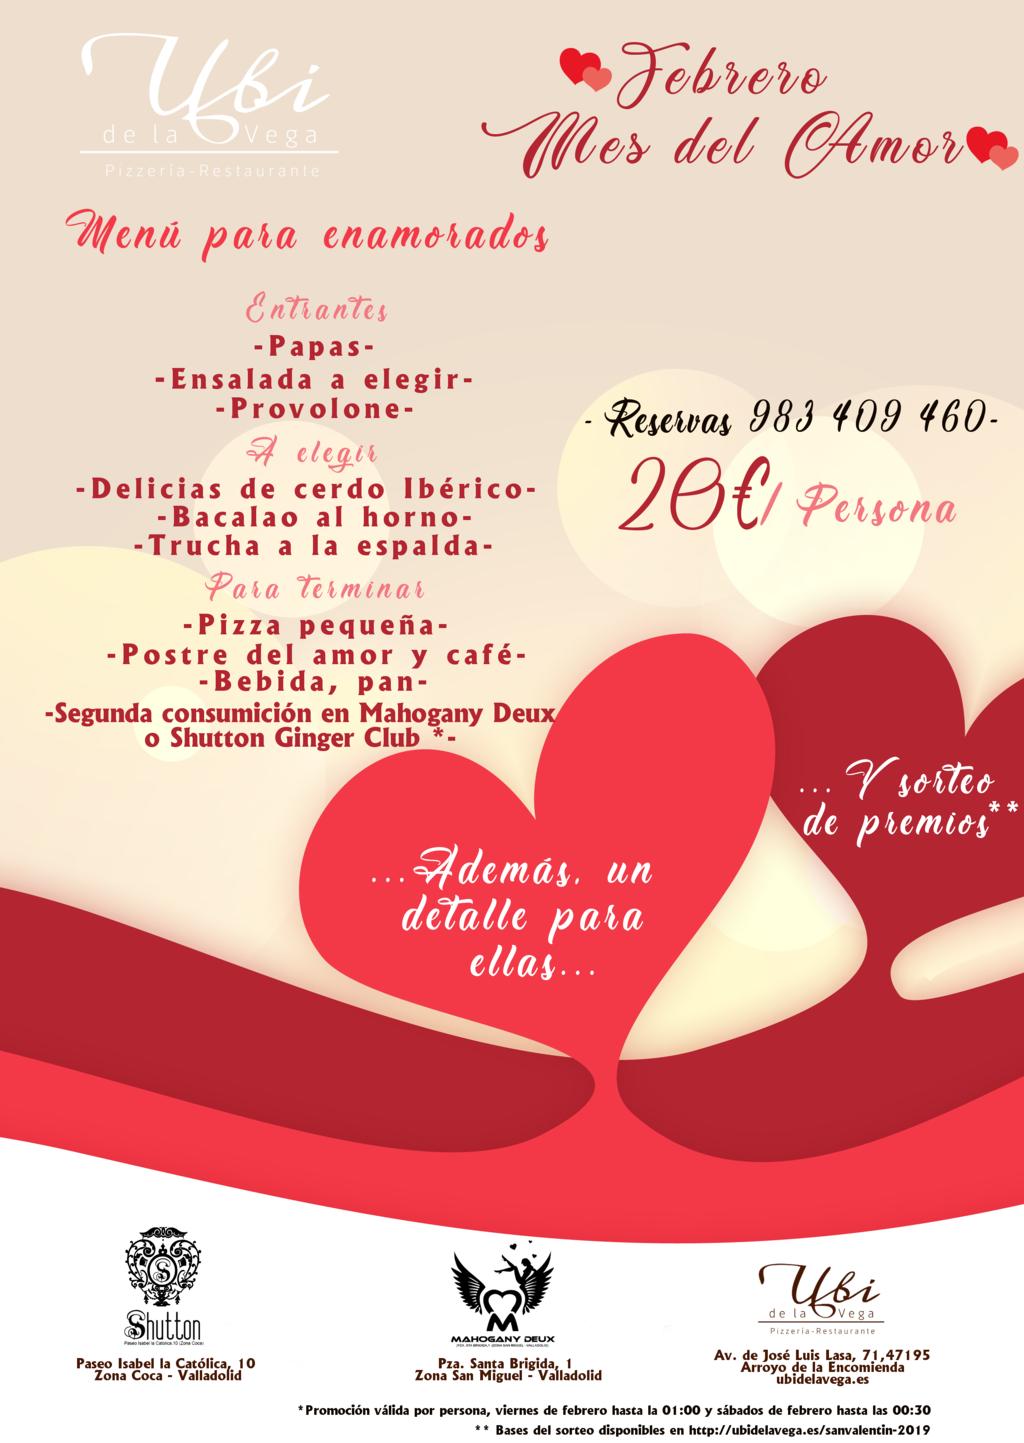 Menú San Valentín 2019. Sorteo de premios